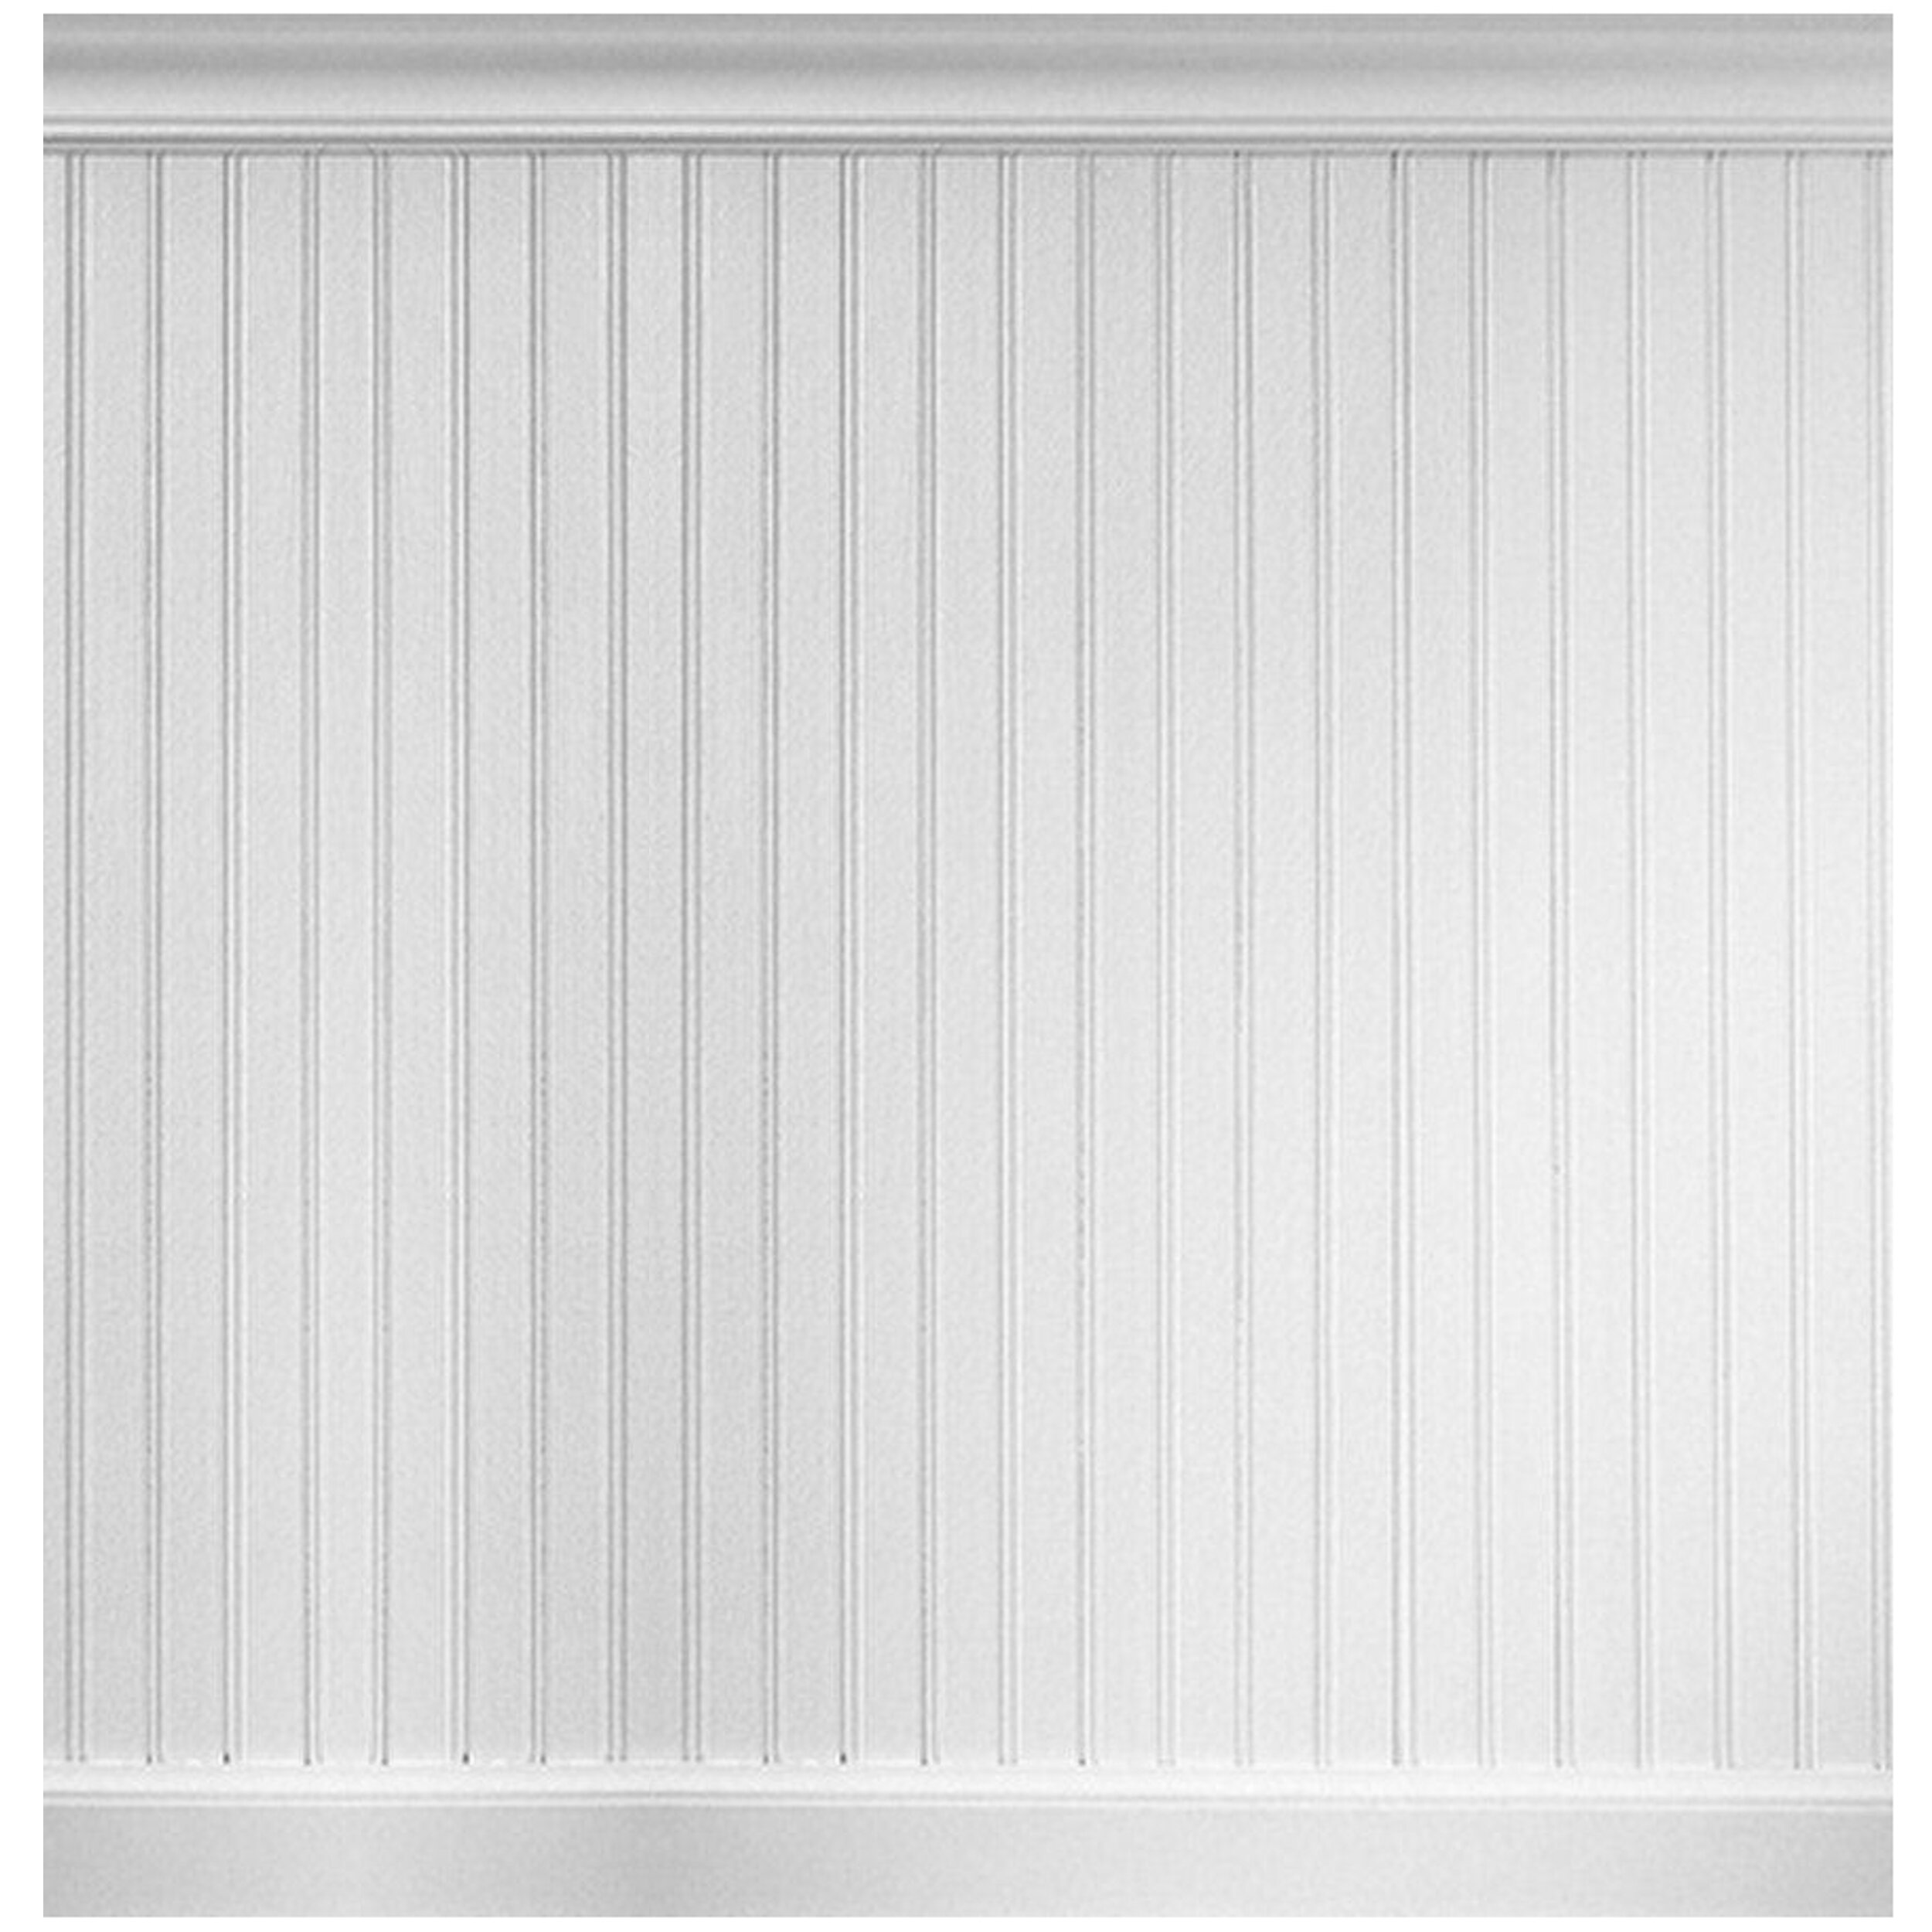 8 Linear ft MDF Overlapping Wainscot Paneling Kit Wayfair